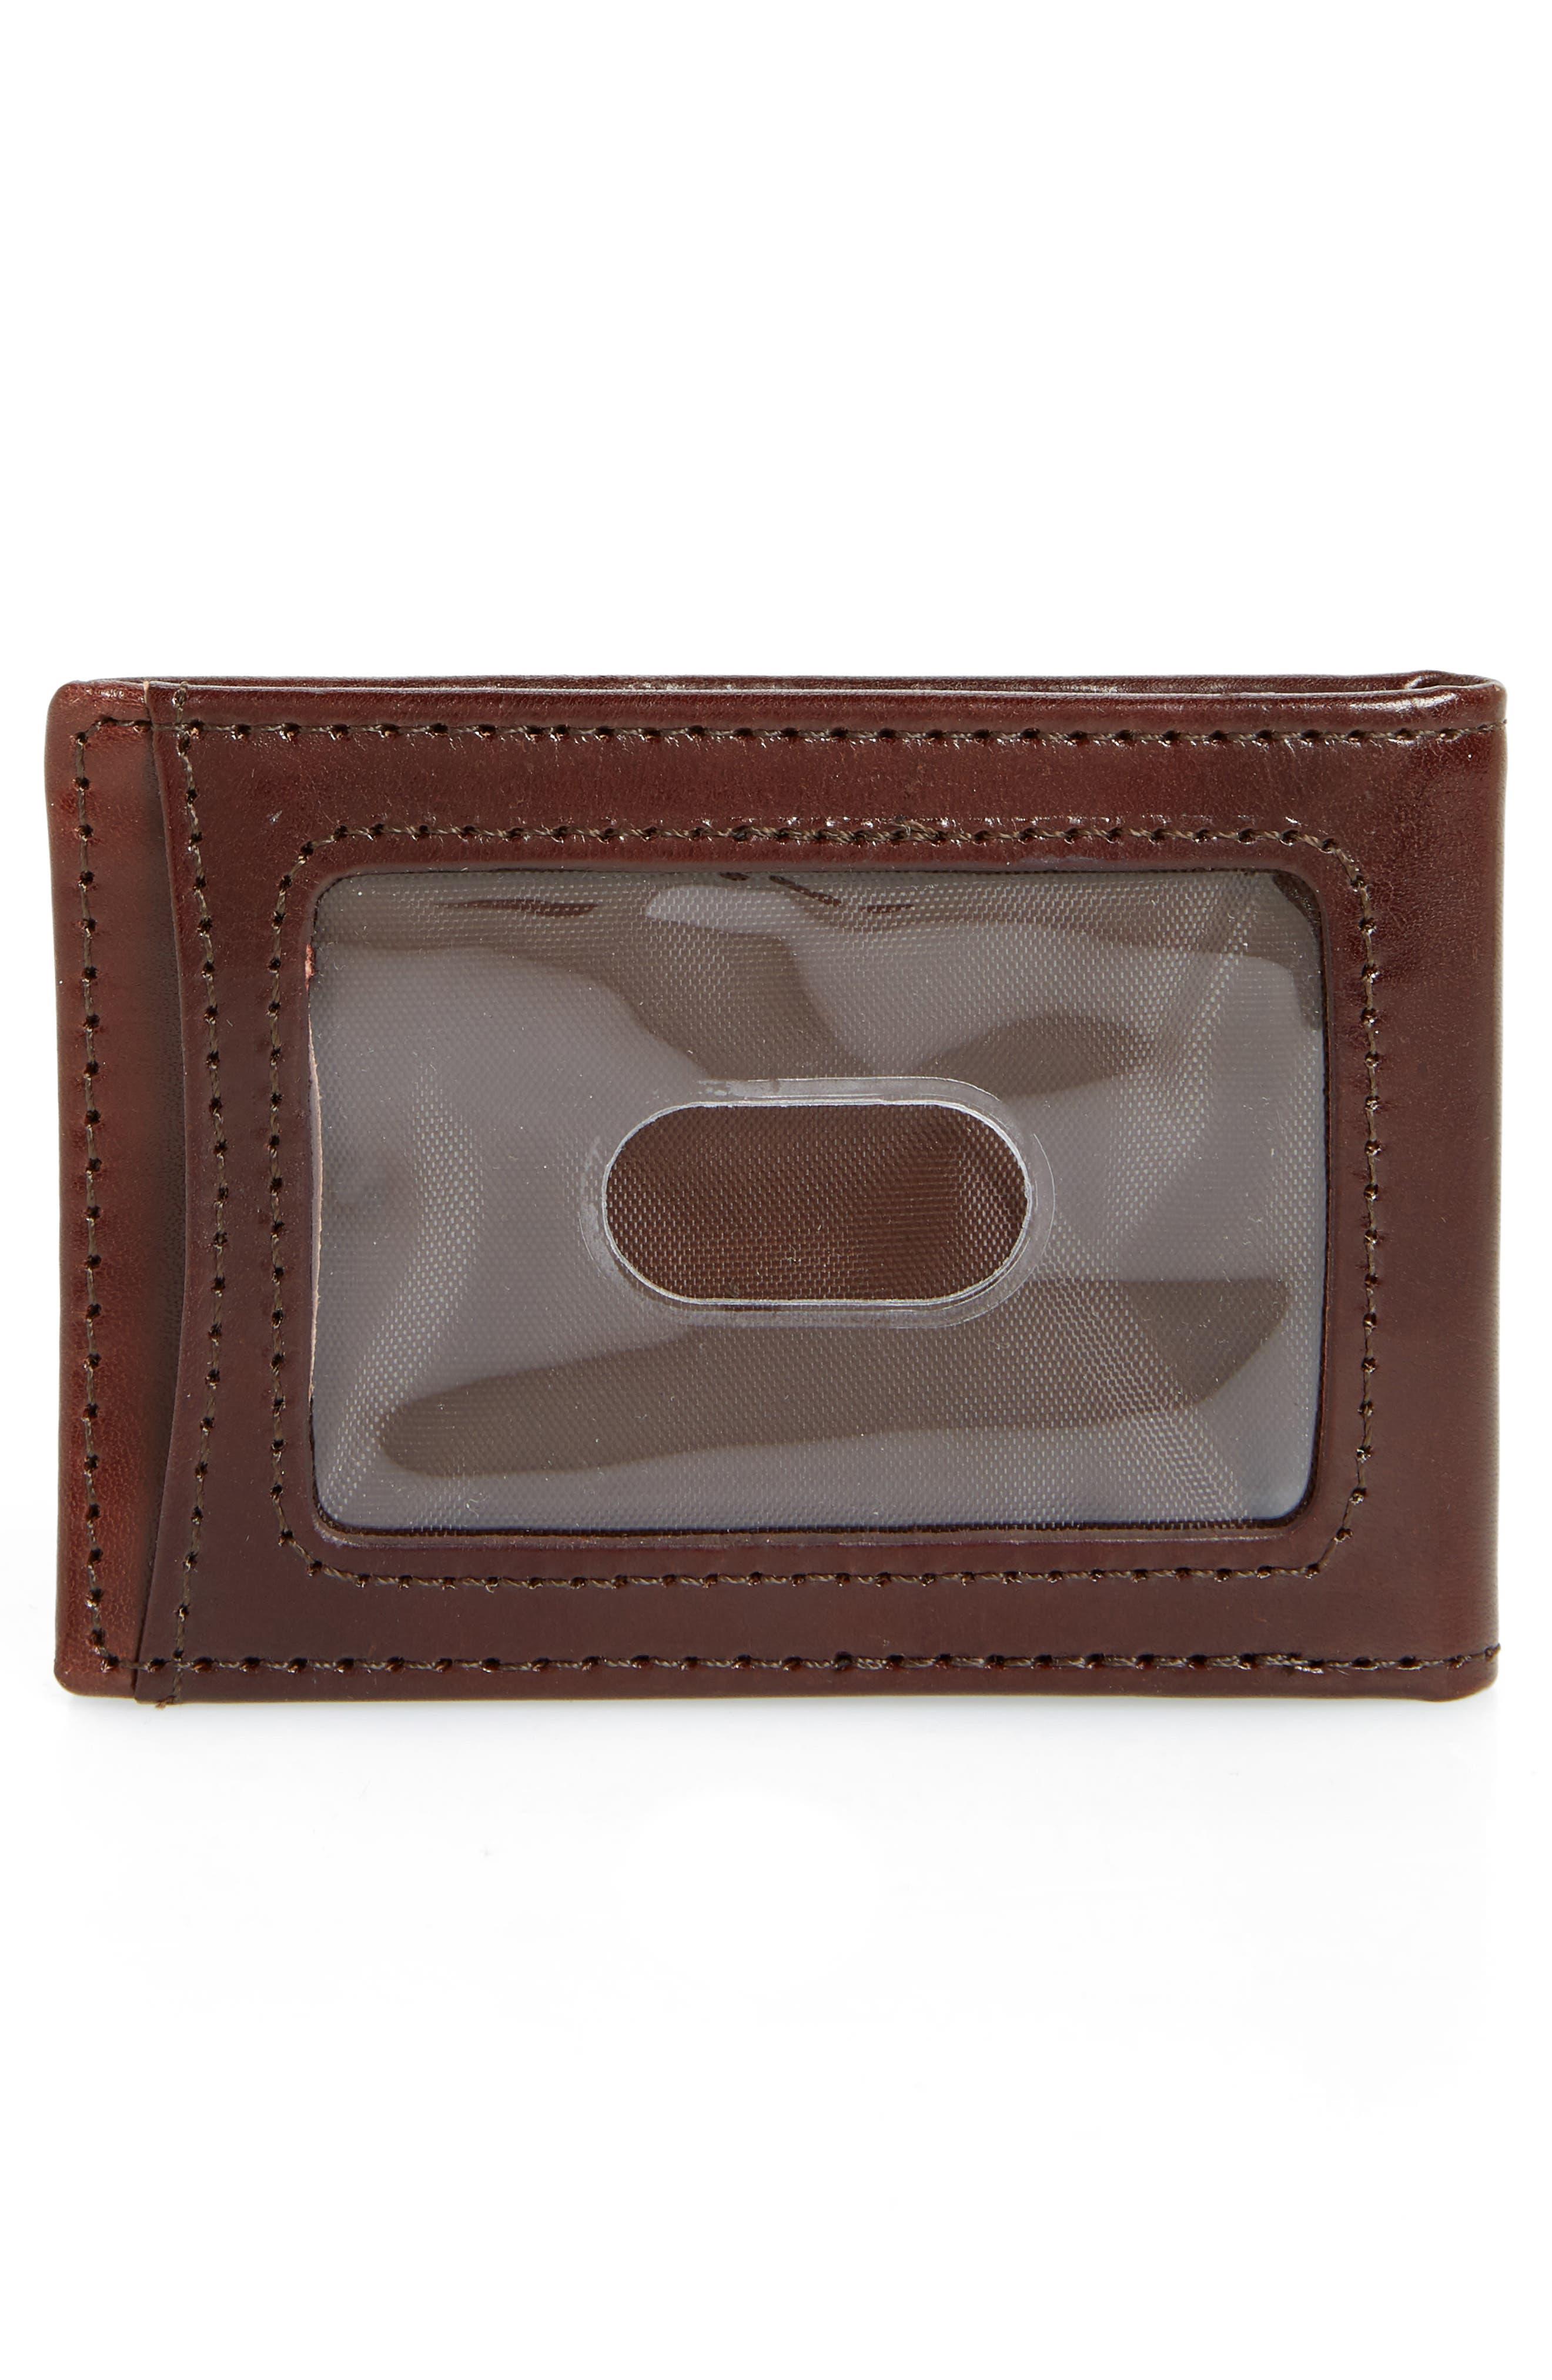 Leather Money Clip Wallet,                             Alternate thumbnail 2, color,                             BROWN